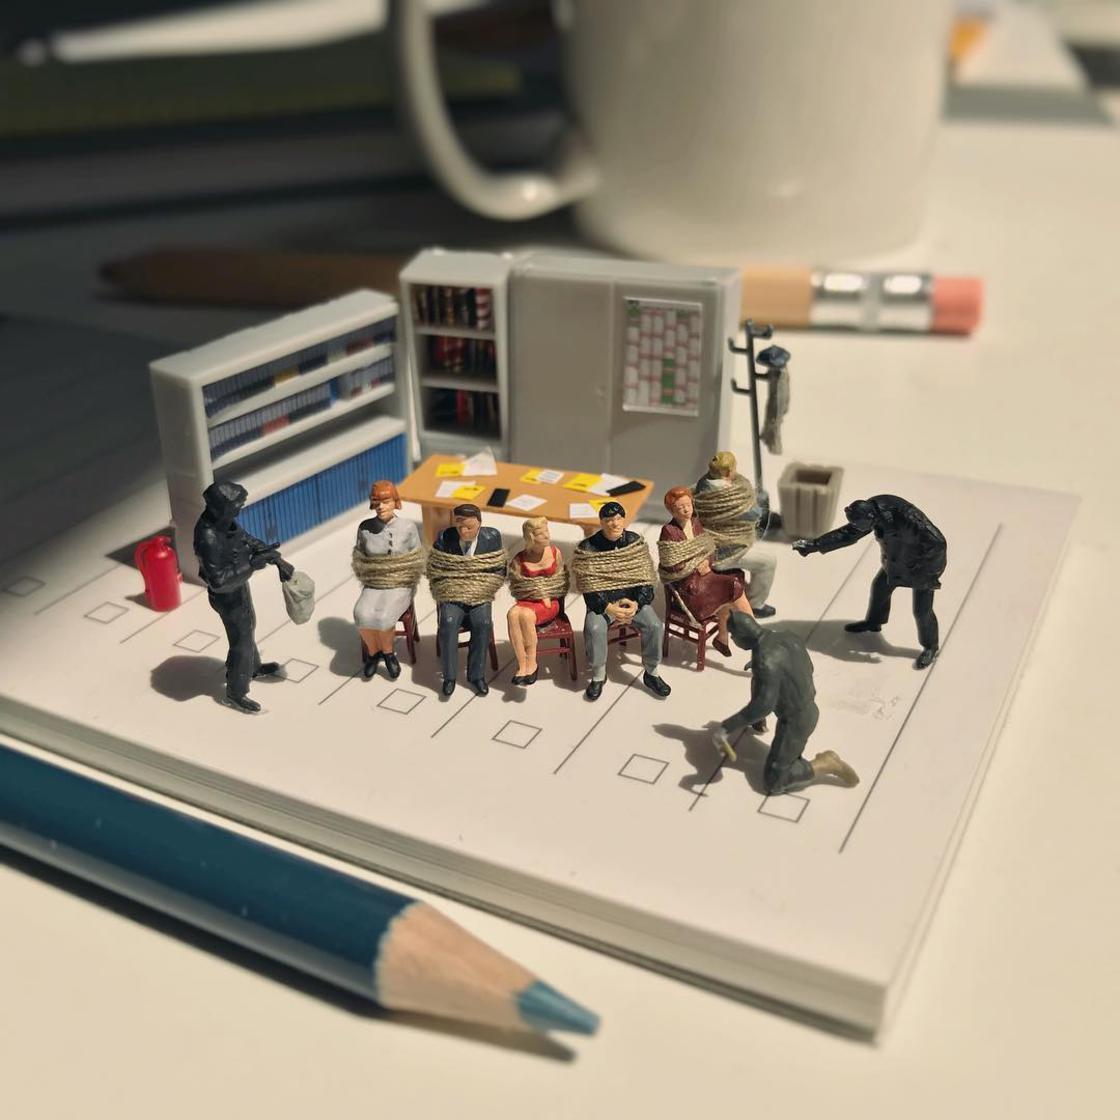 Miniature Office - When a creative employee creates miniature scenes